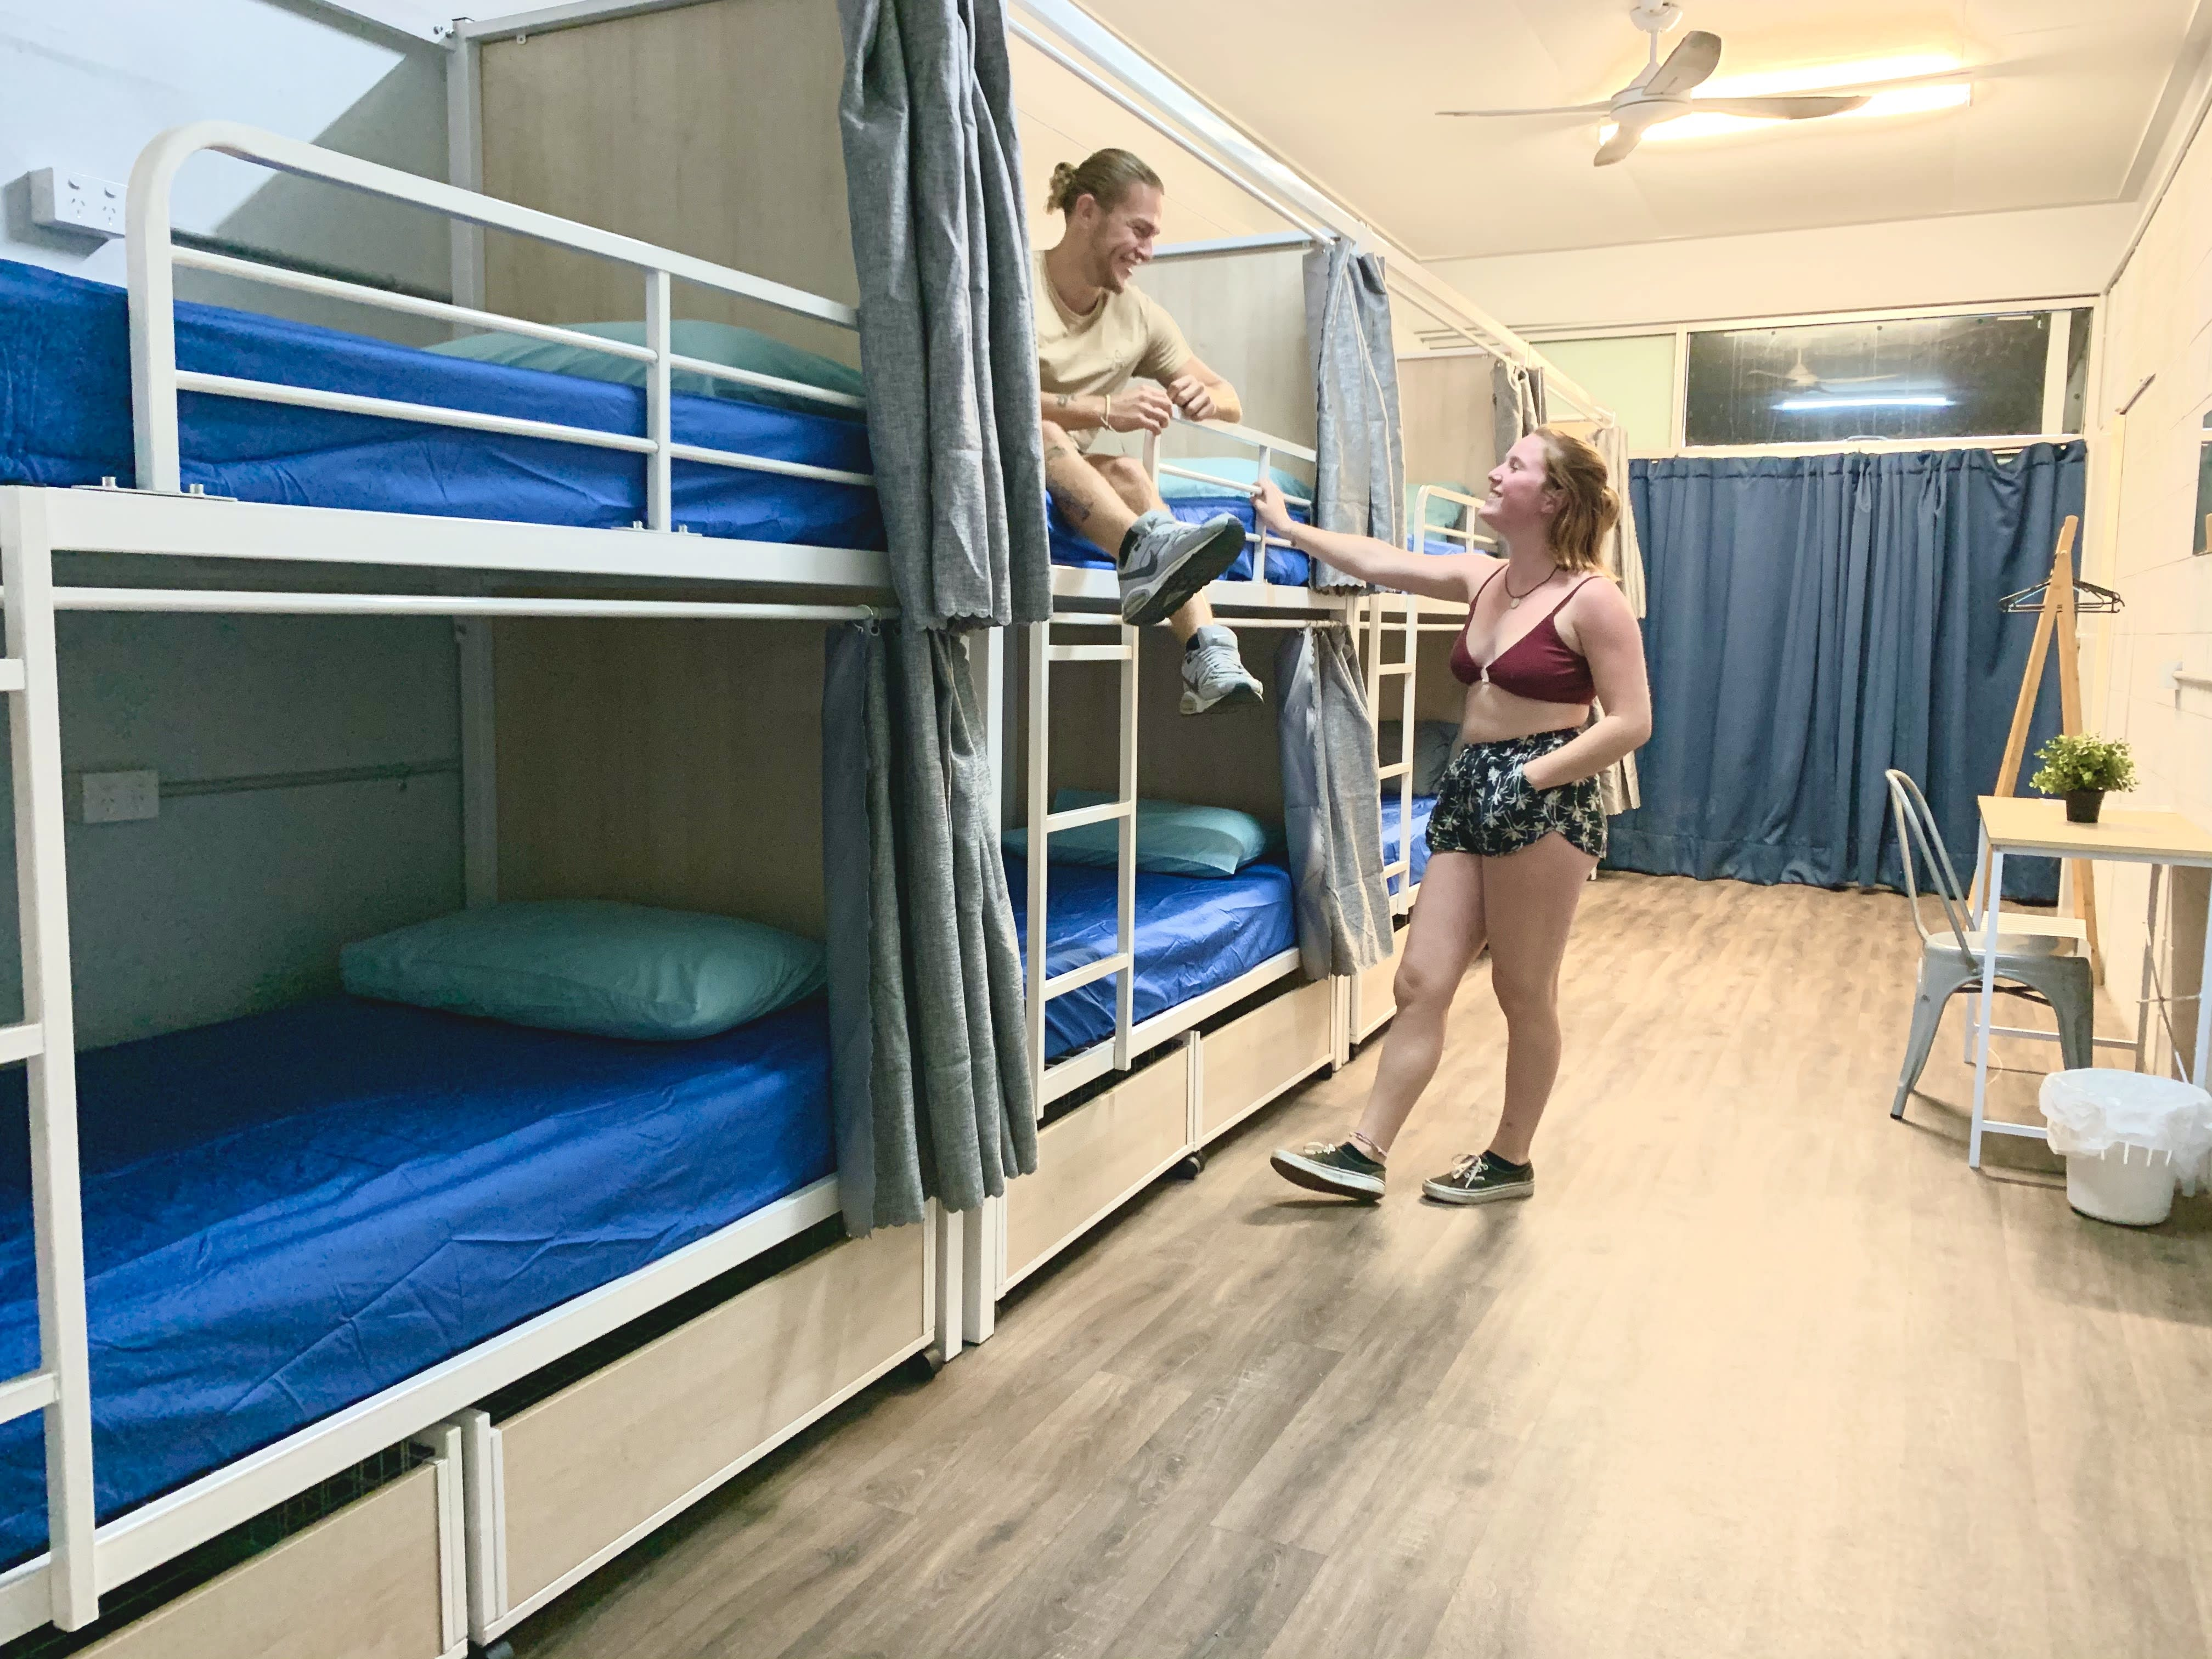 HOSTEL - Mumma's Hostel Cairns